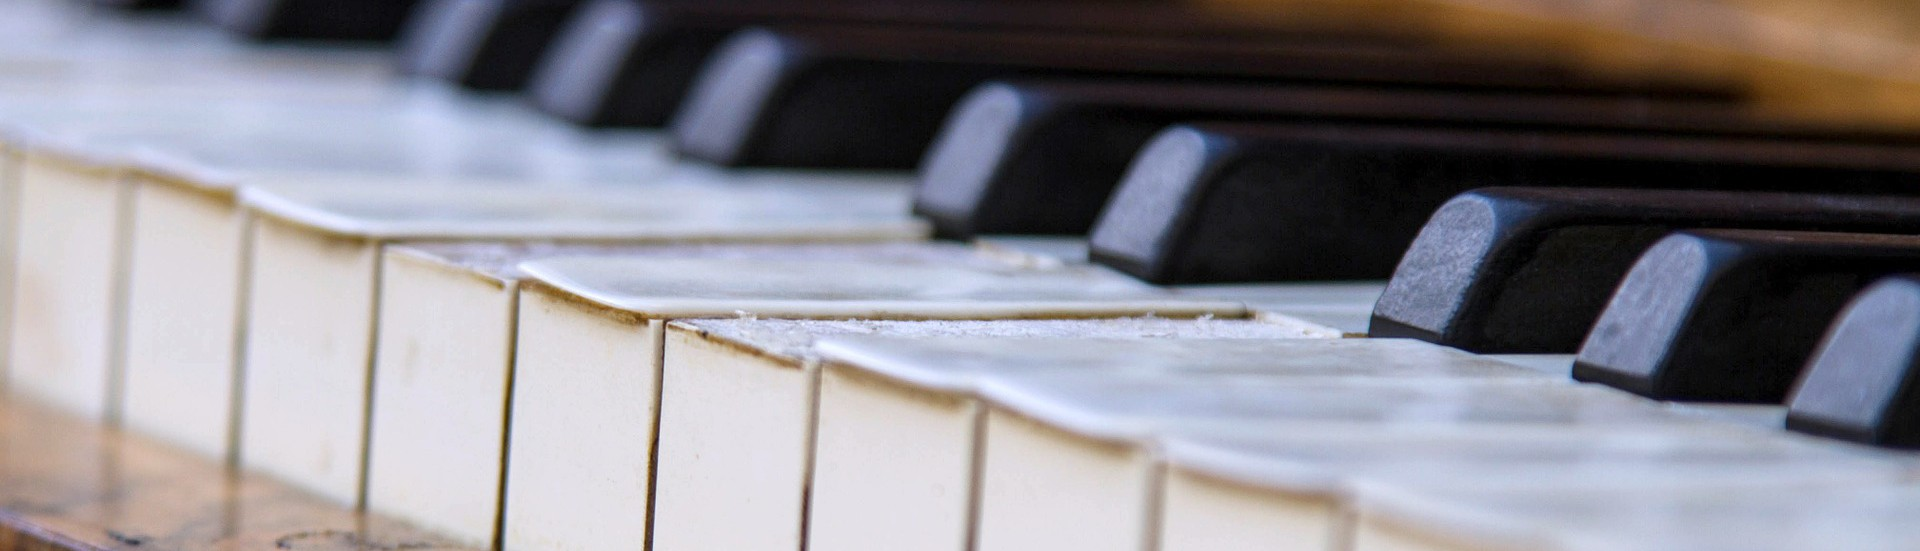 cropped-piano-453845_1920.jpg